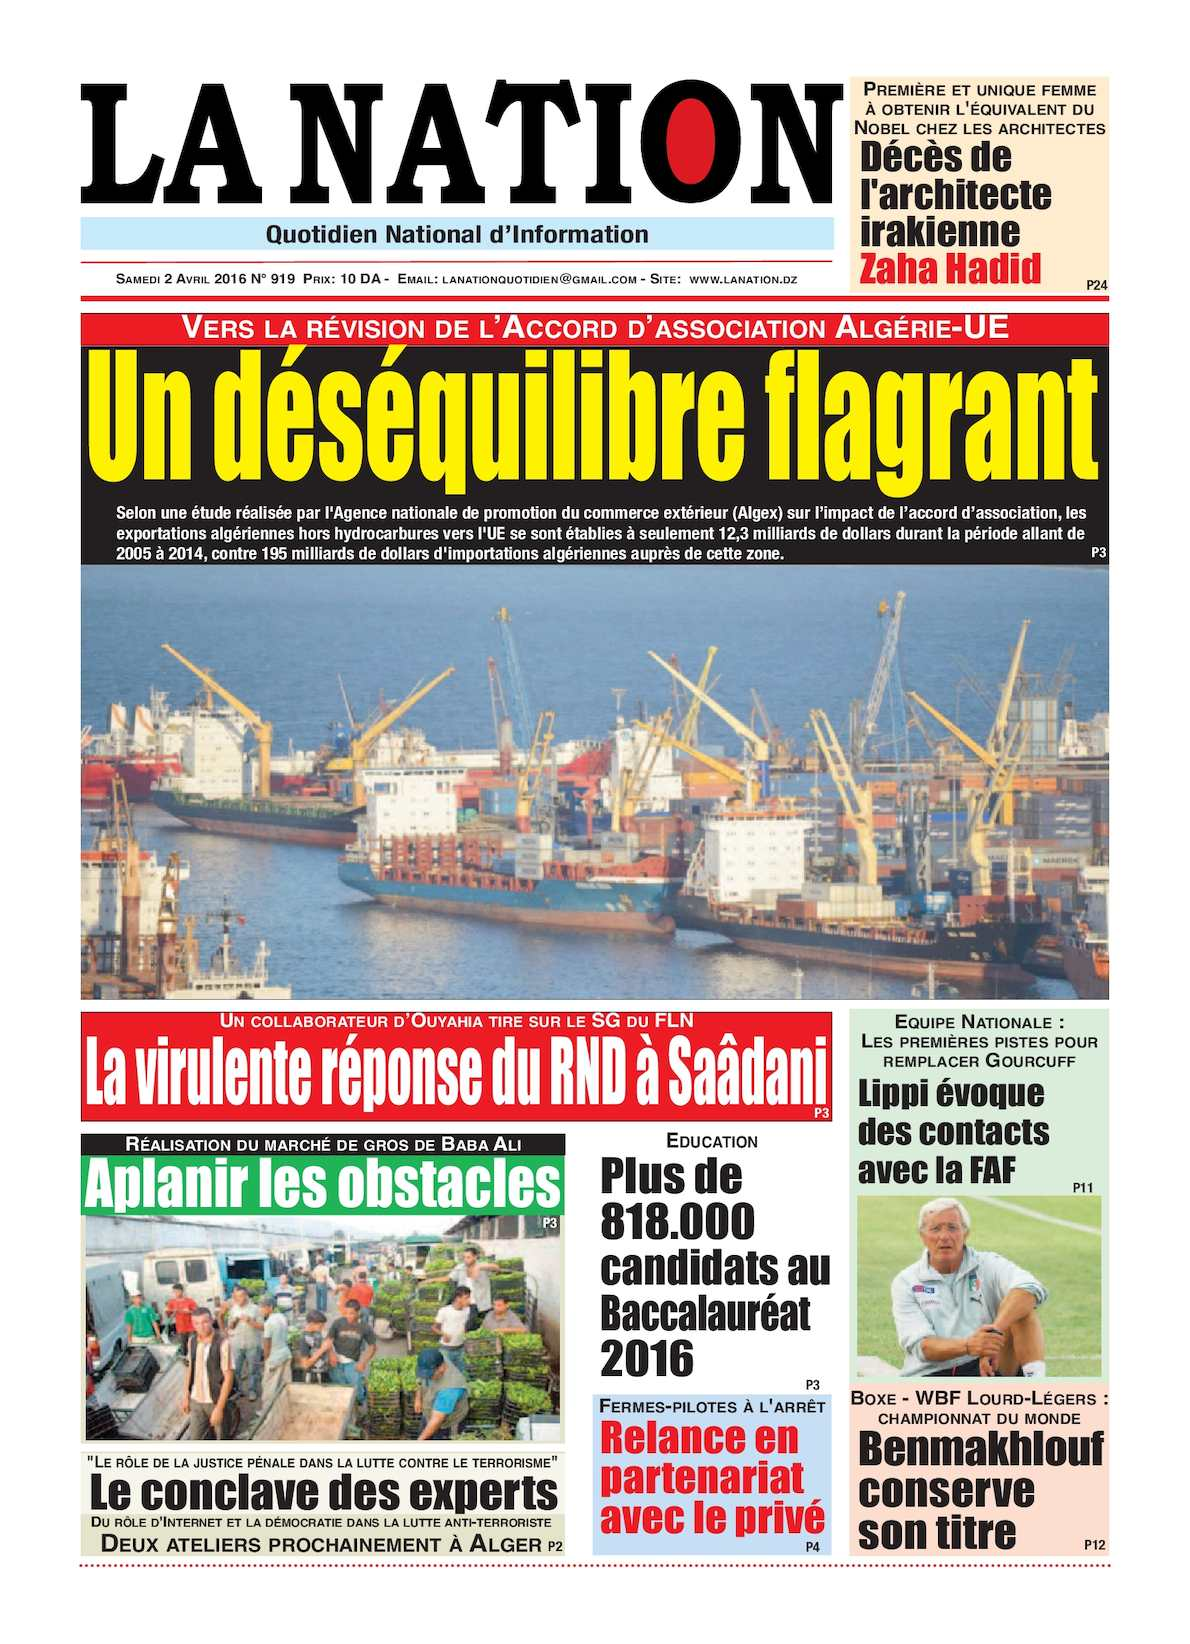 La Nation Edition N 919